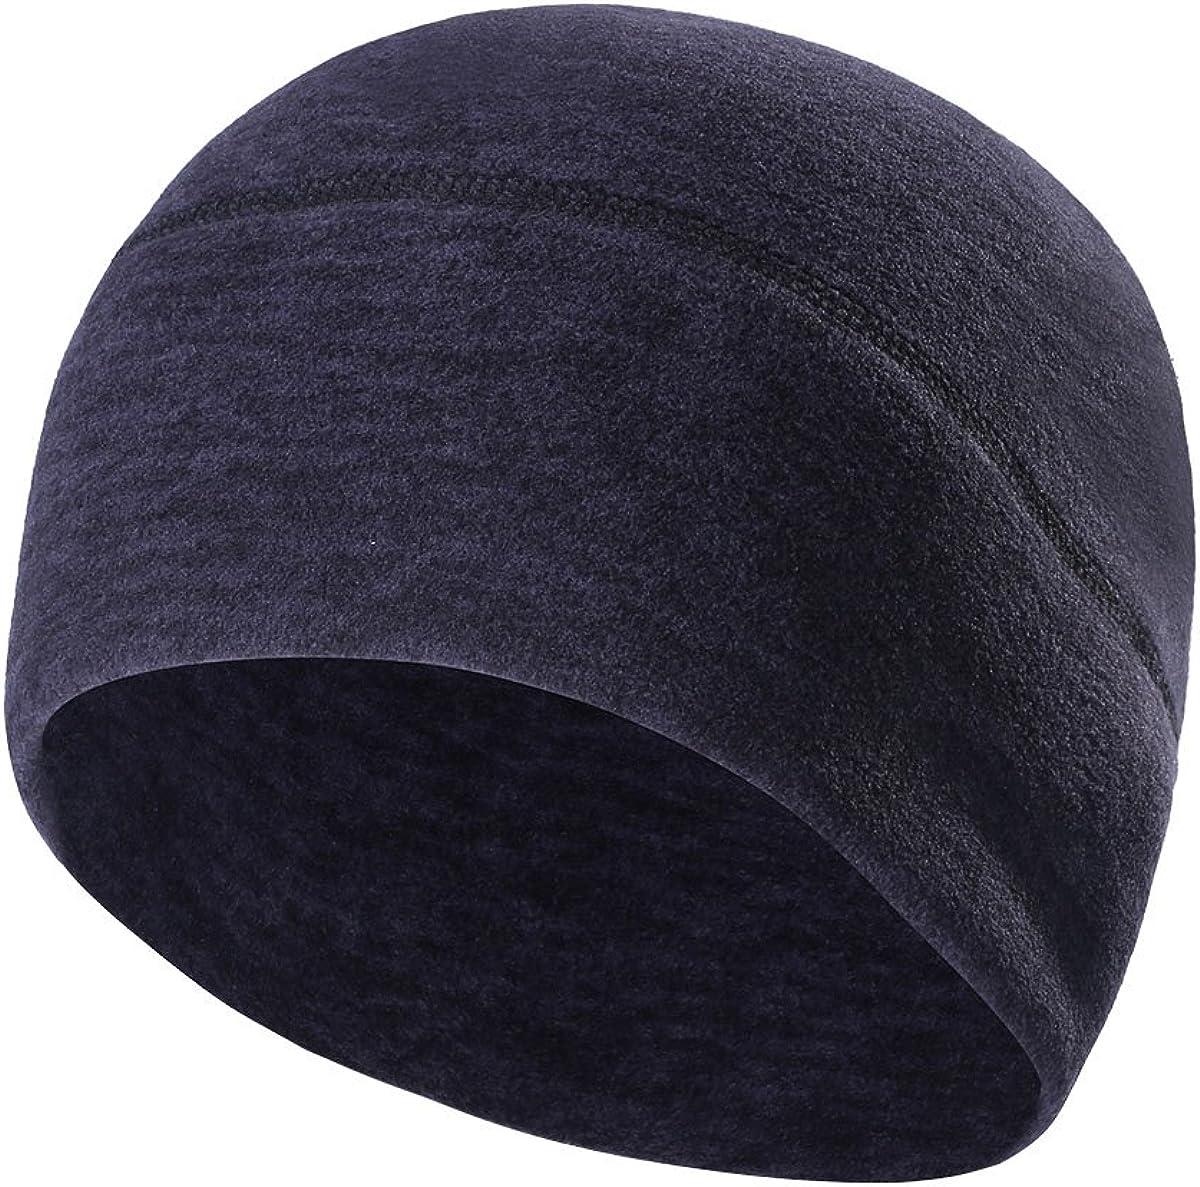 Skull Cap Ear Warmer Helmet Liner for Men - Winter Beanie Hat for Skiing,Running,Cycling - Fits Under Helmet